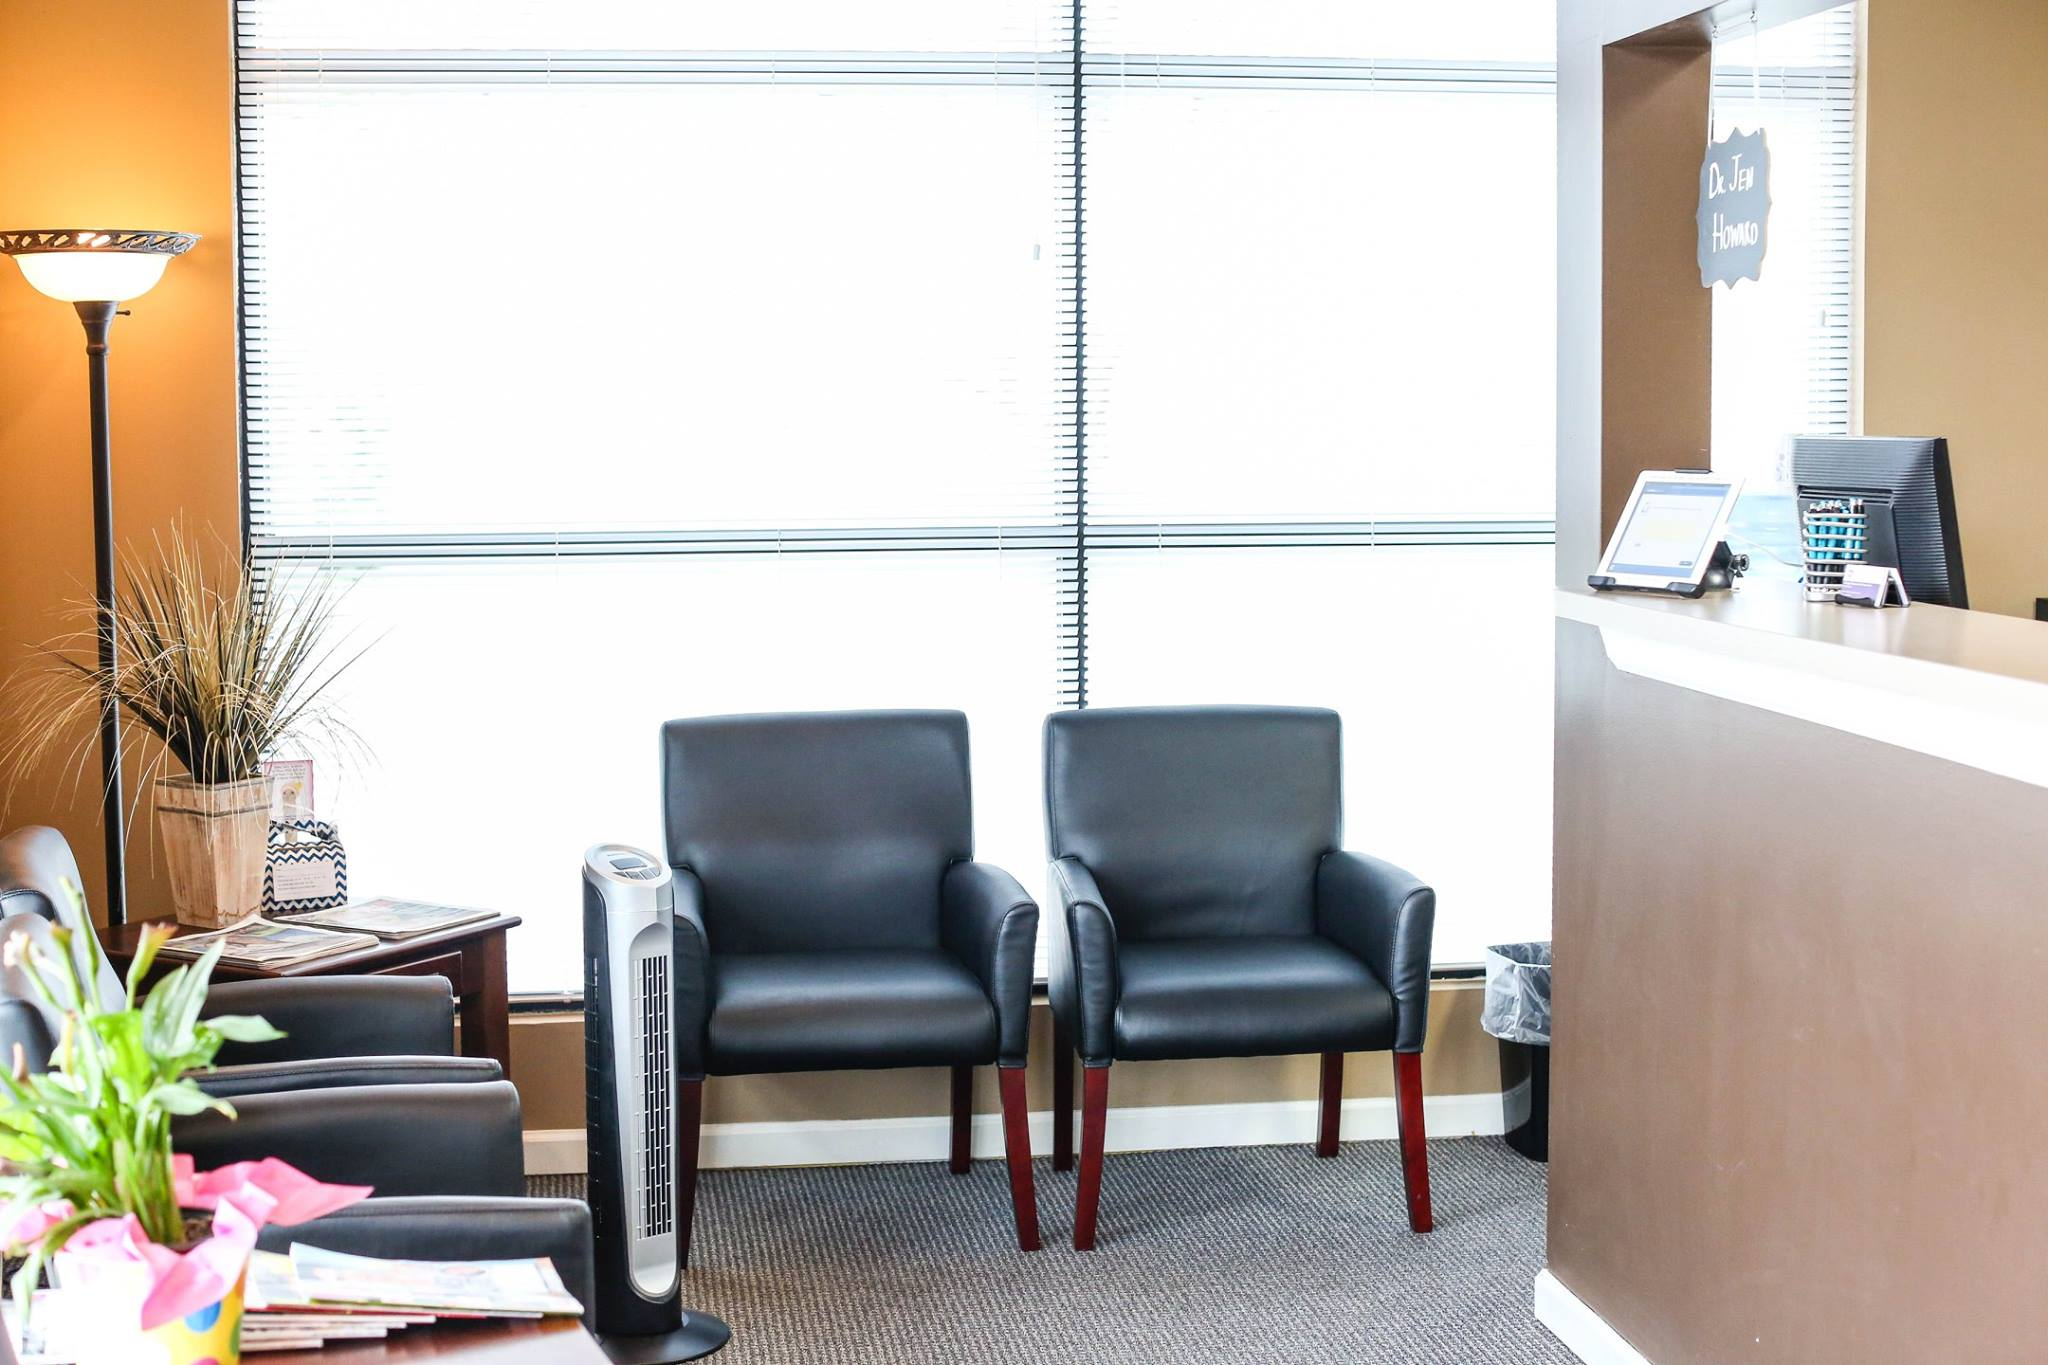 Chiropractic & Acupuncture in Omaha - Martin & Schrage ...